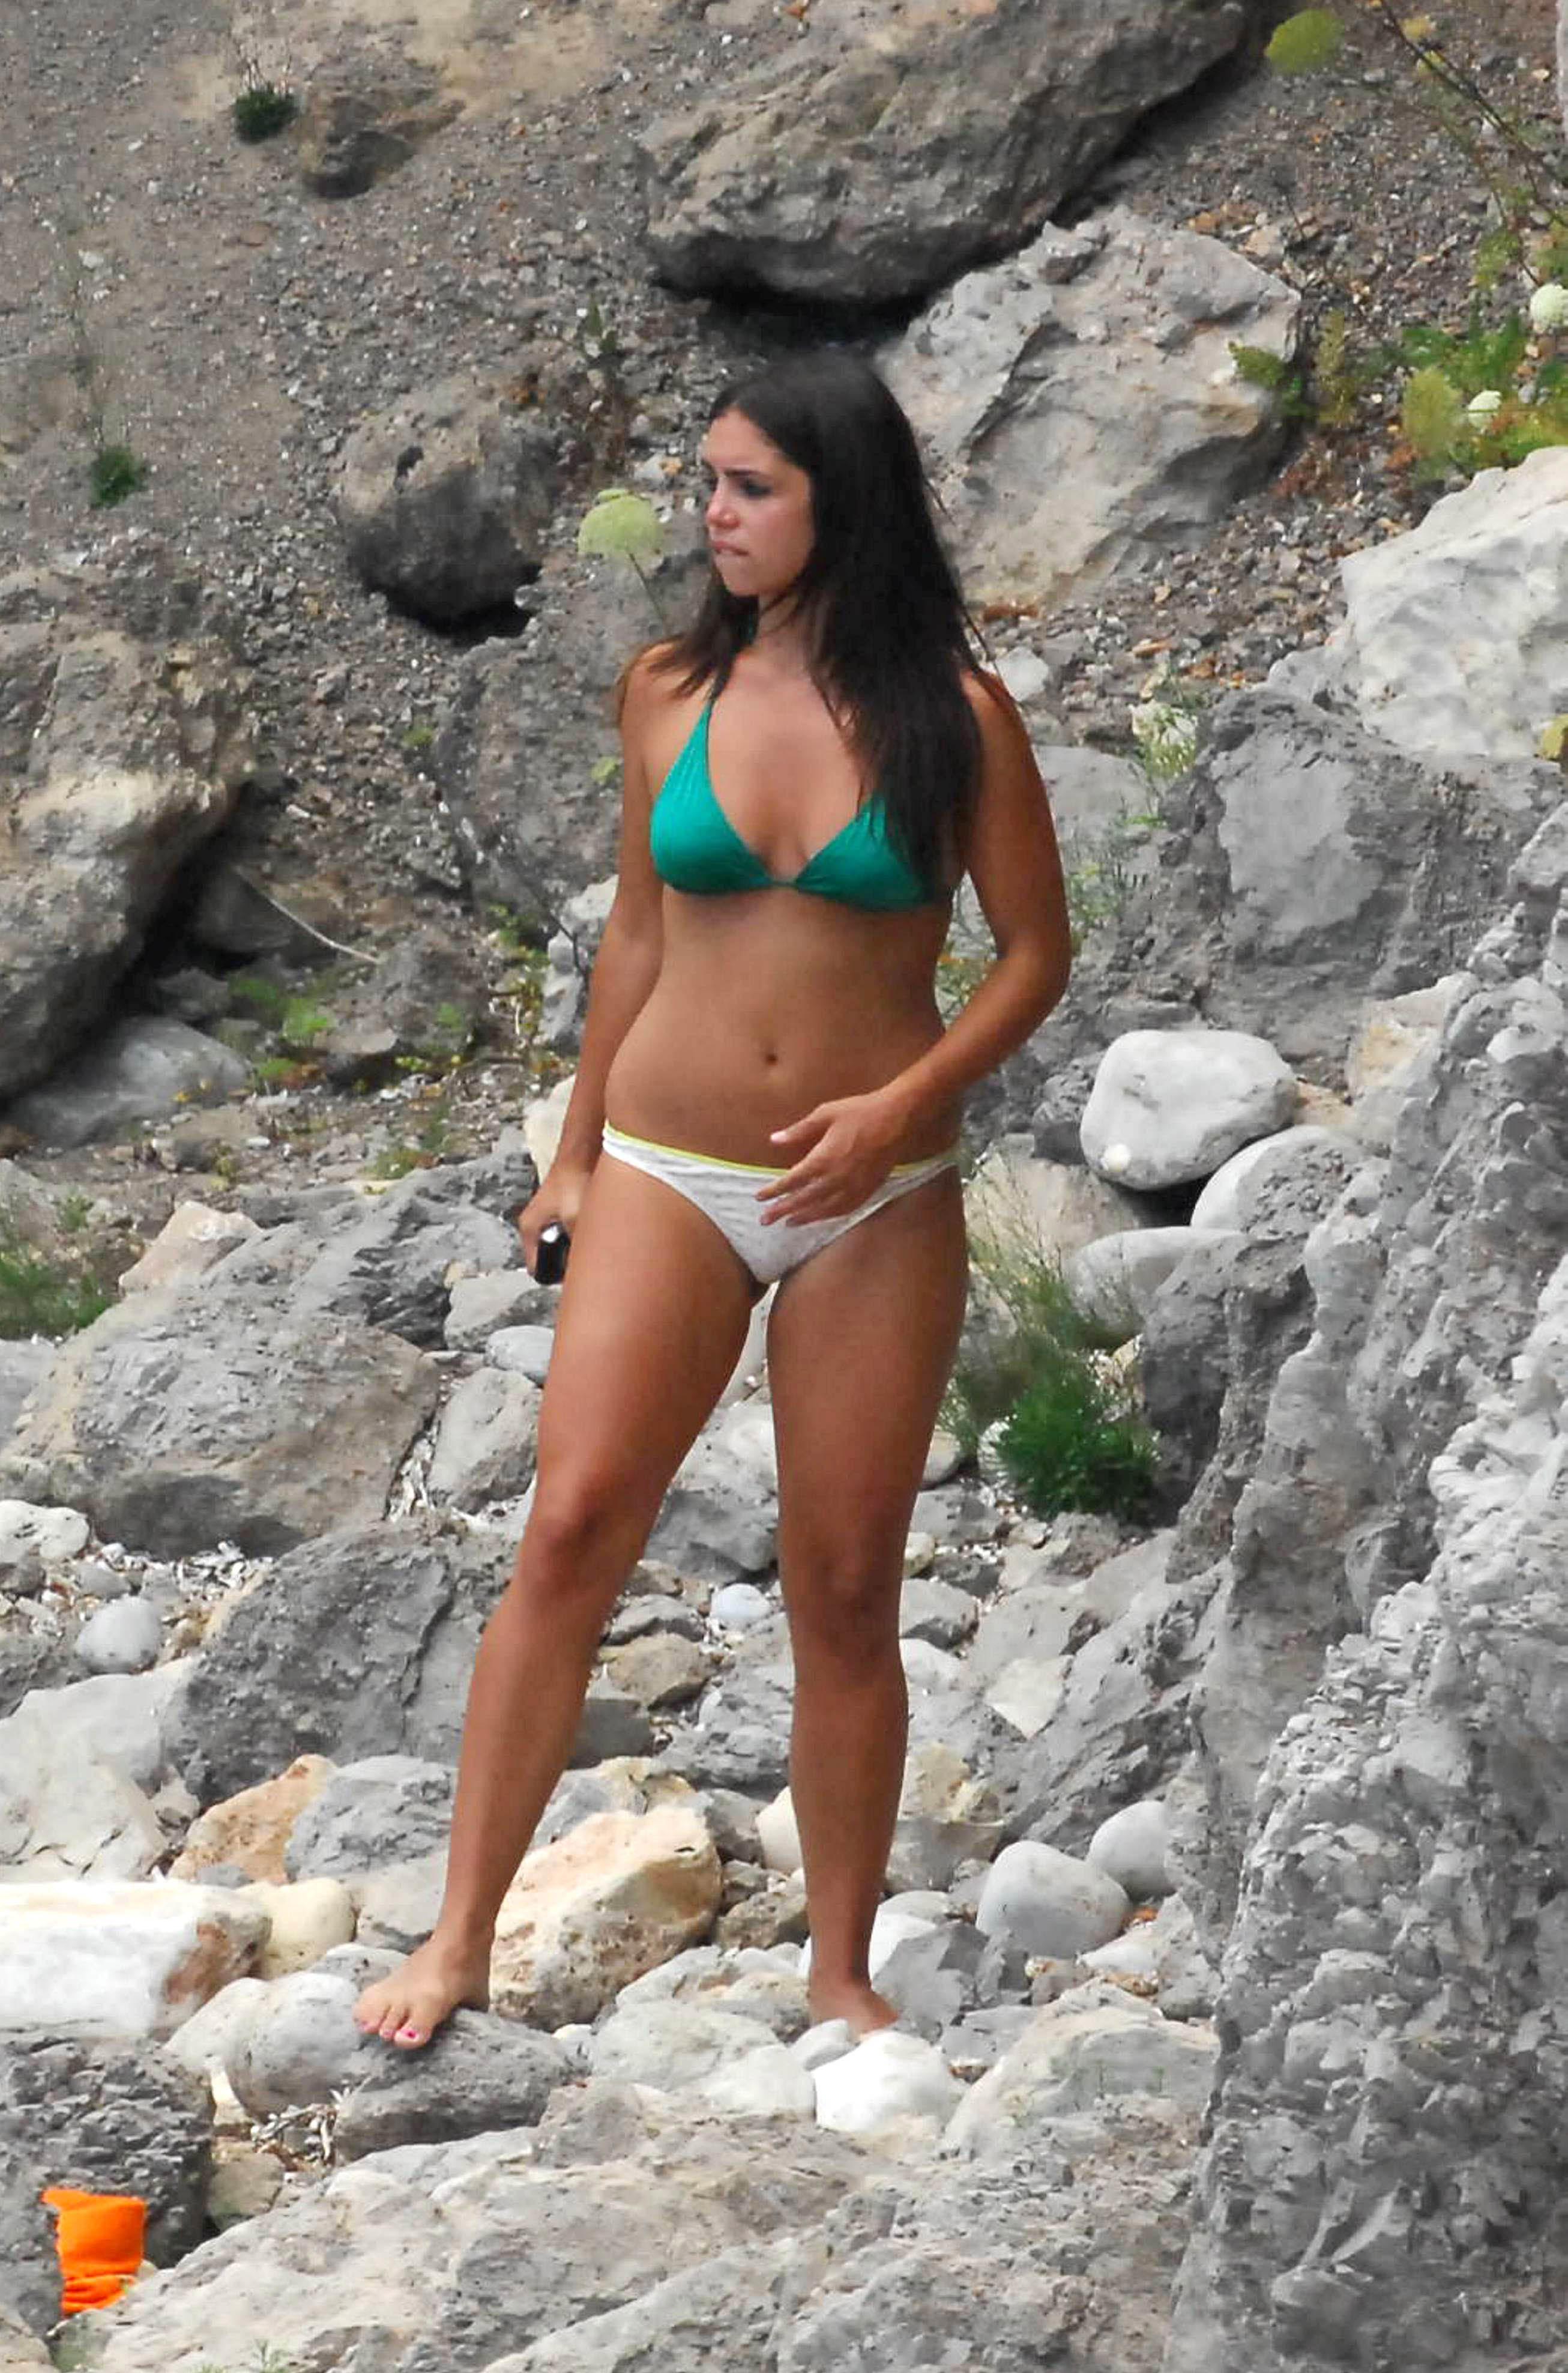 Ana de armas nude sex scene in mentiras y scandalplanetcom - 2 part 5